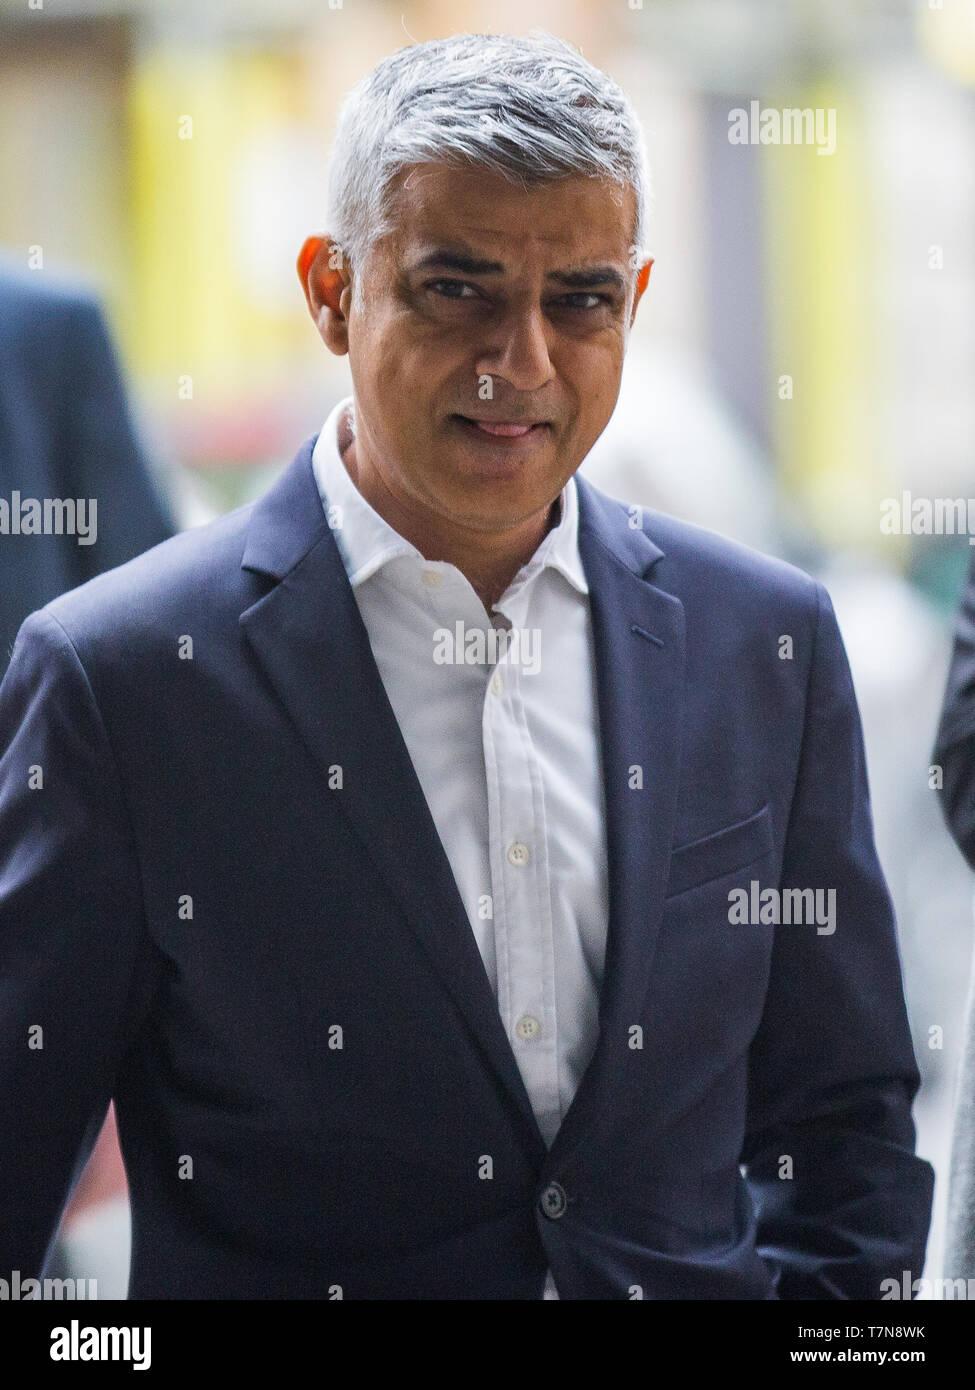 Mayor of London Sadiq Khan arrives at the BBC for the Sunday Politics Show, London, UK  Featuring: Sadiq Khan Where: London, United Kingdom When: 07 Apr 2019 Credit: Wheatley/WENN - Stock Image